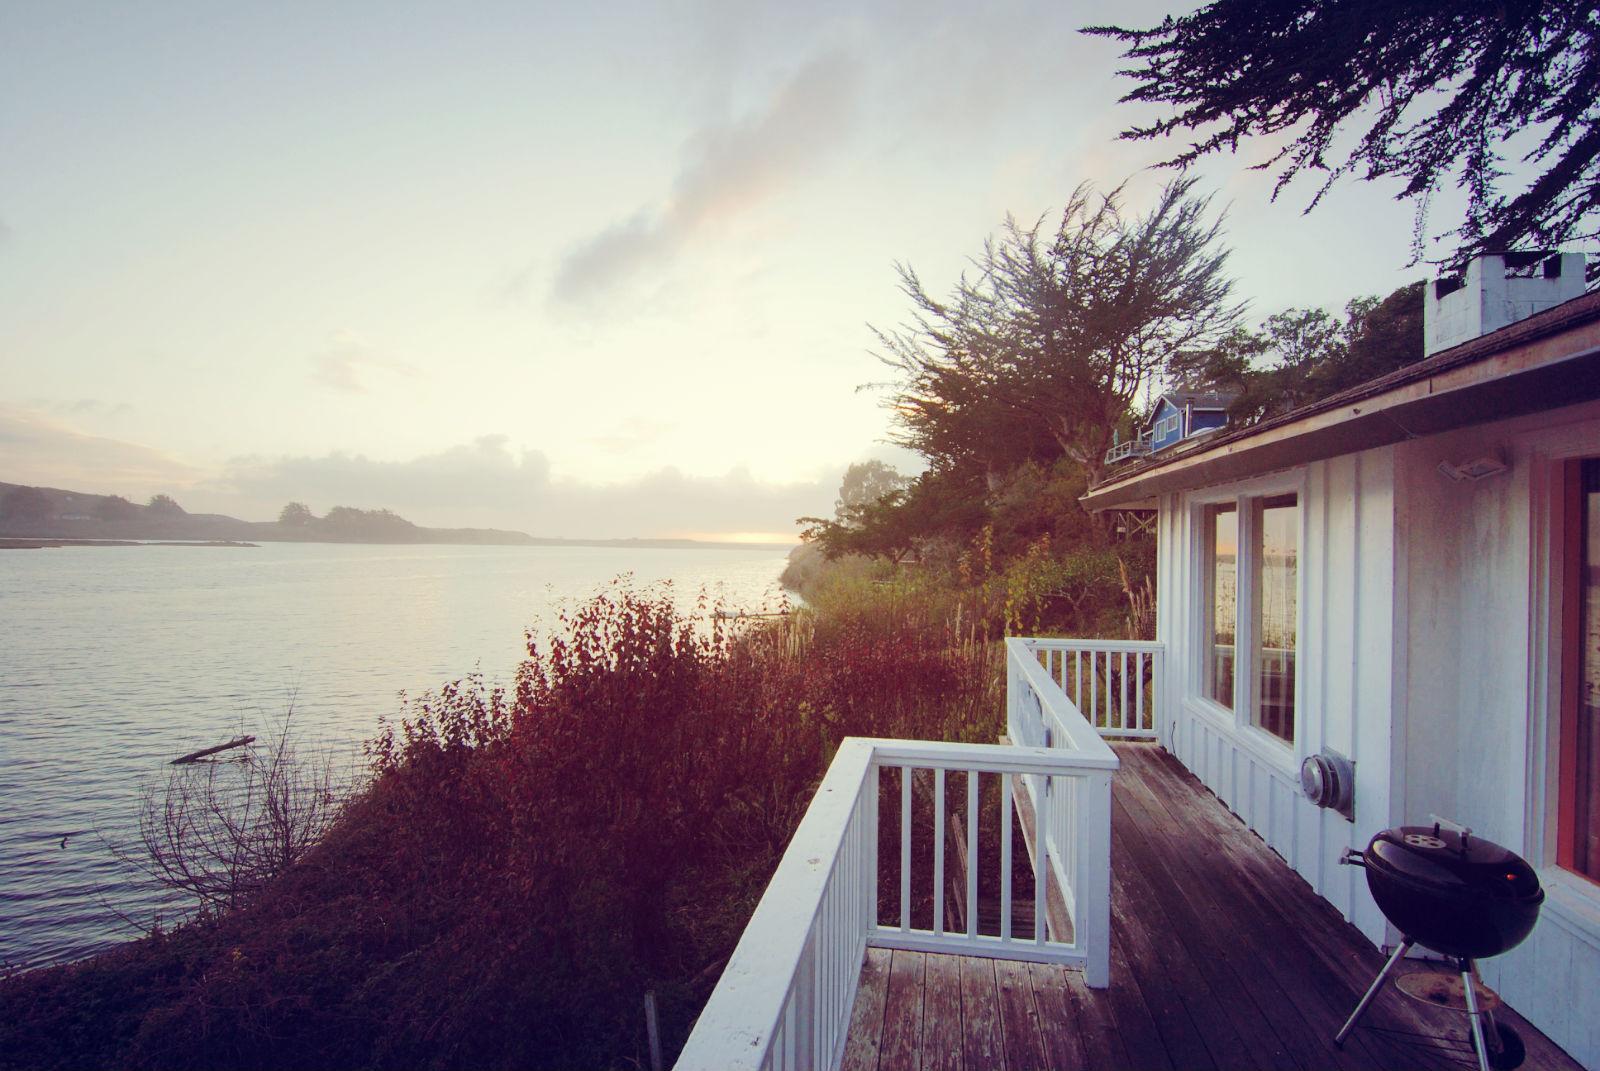 Deck, Rosewood Suite, Jenner Inn